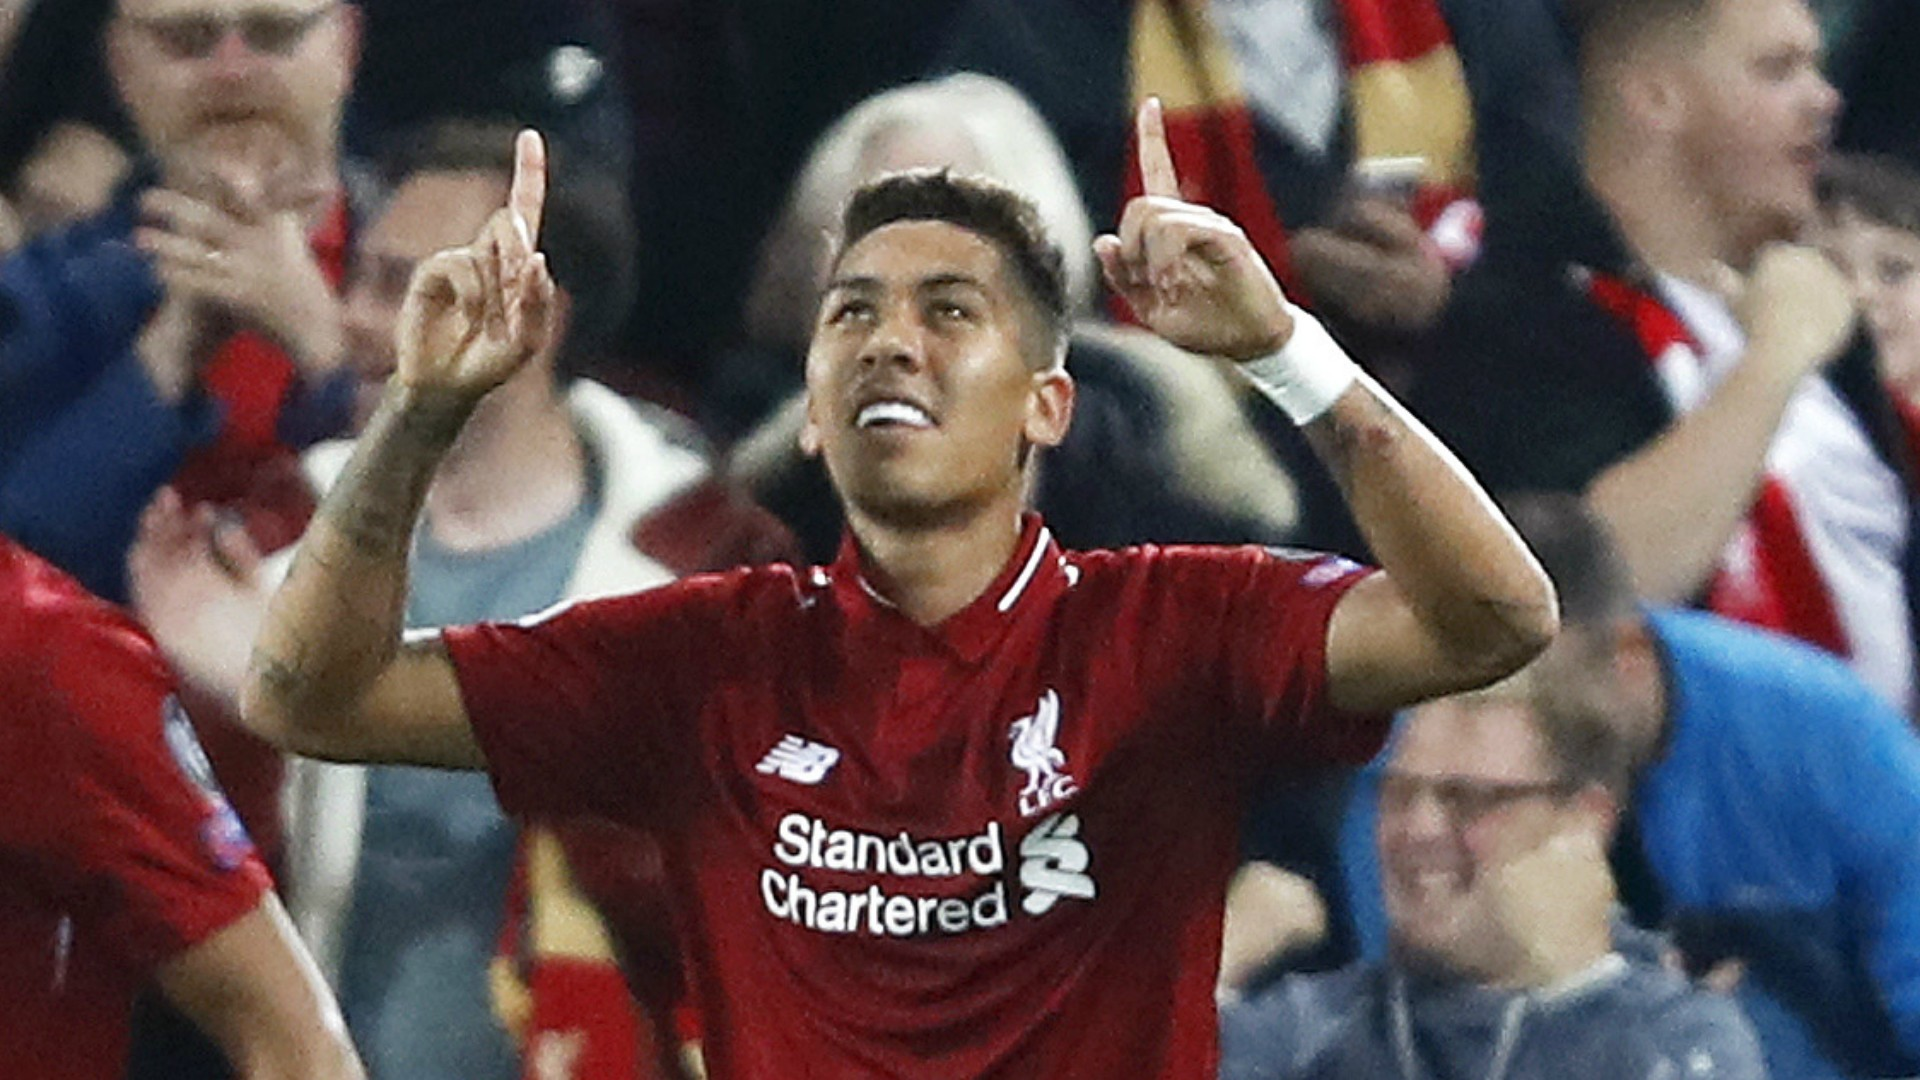 UCL (2018-2019) Report: Liverpool 3 Paris Saint-Germain 2 - Firmino strikes late as Reds edge five-goal thriller